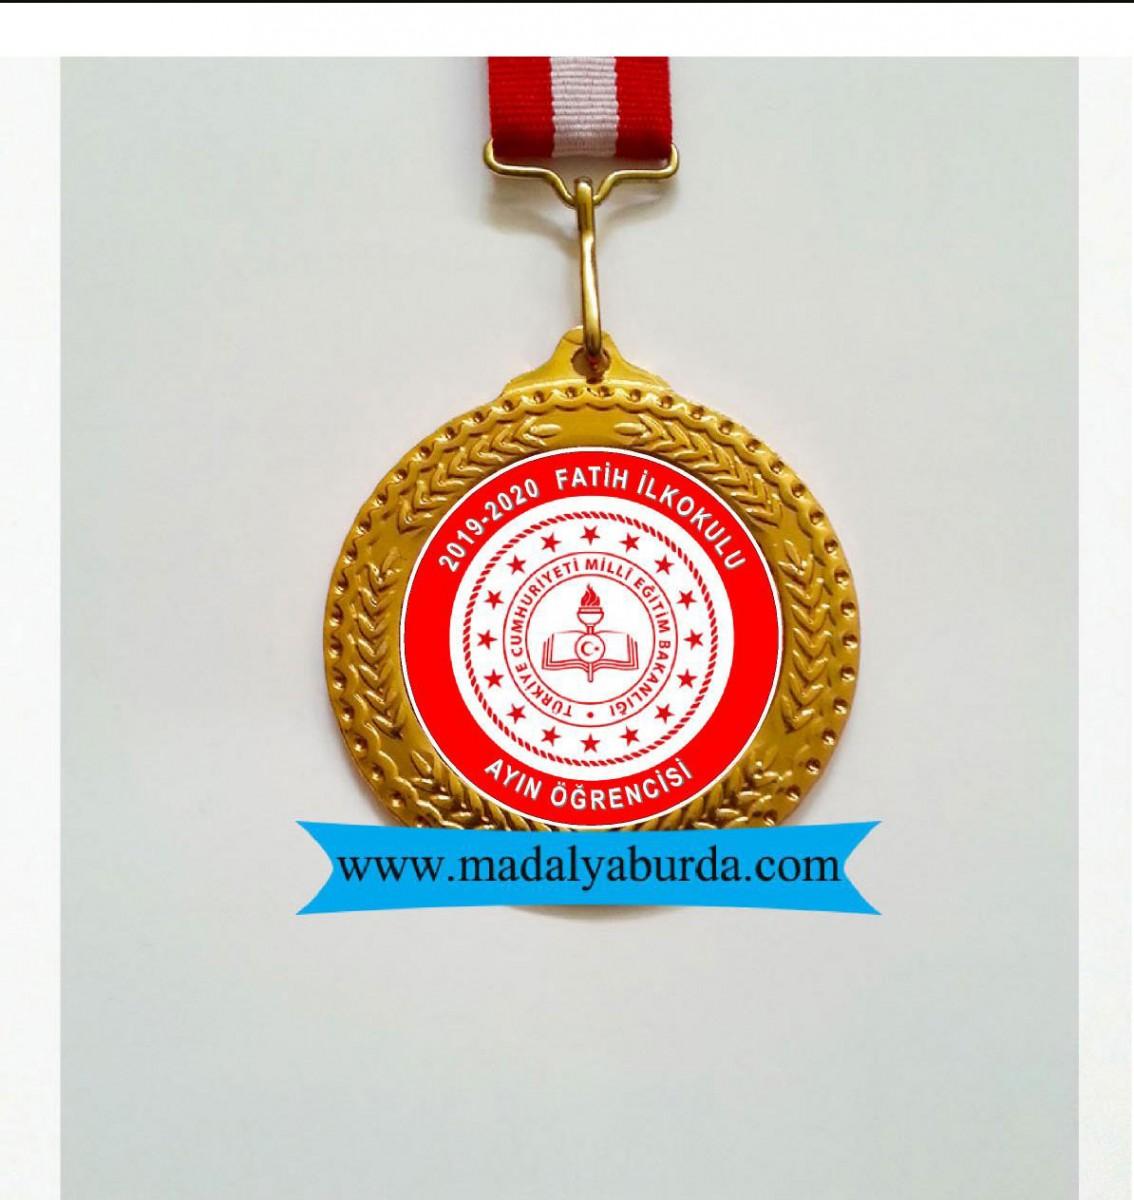 Ayın Öğrencisi Madalyası